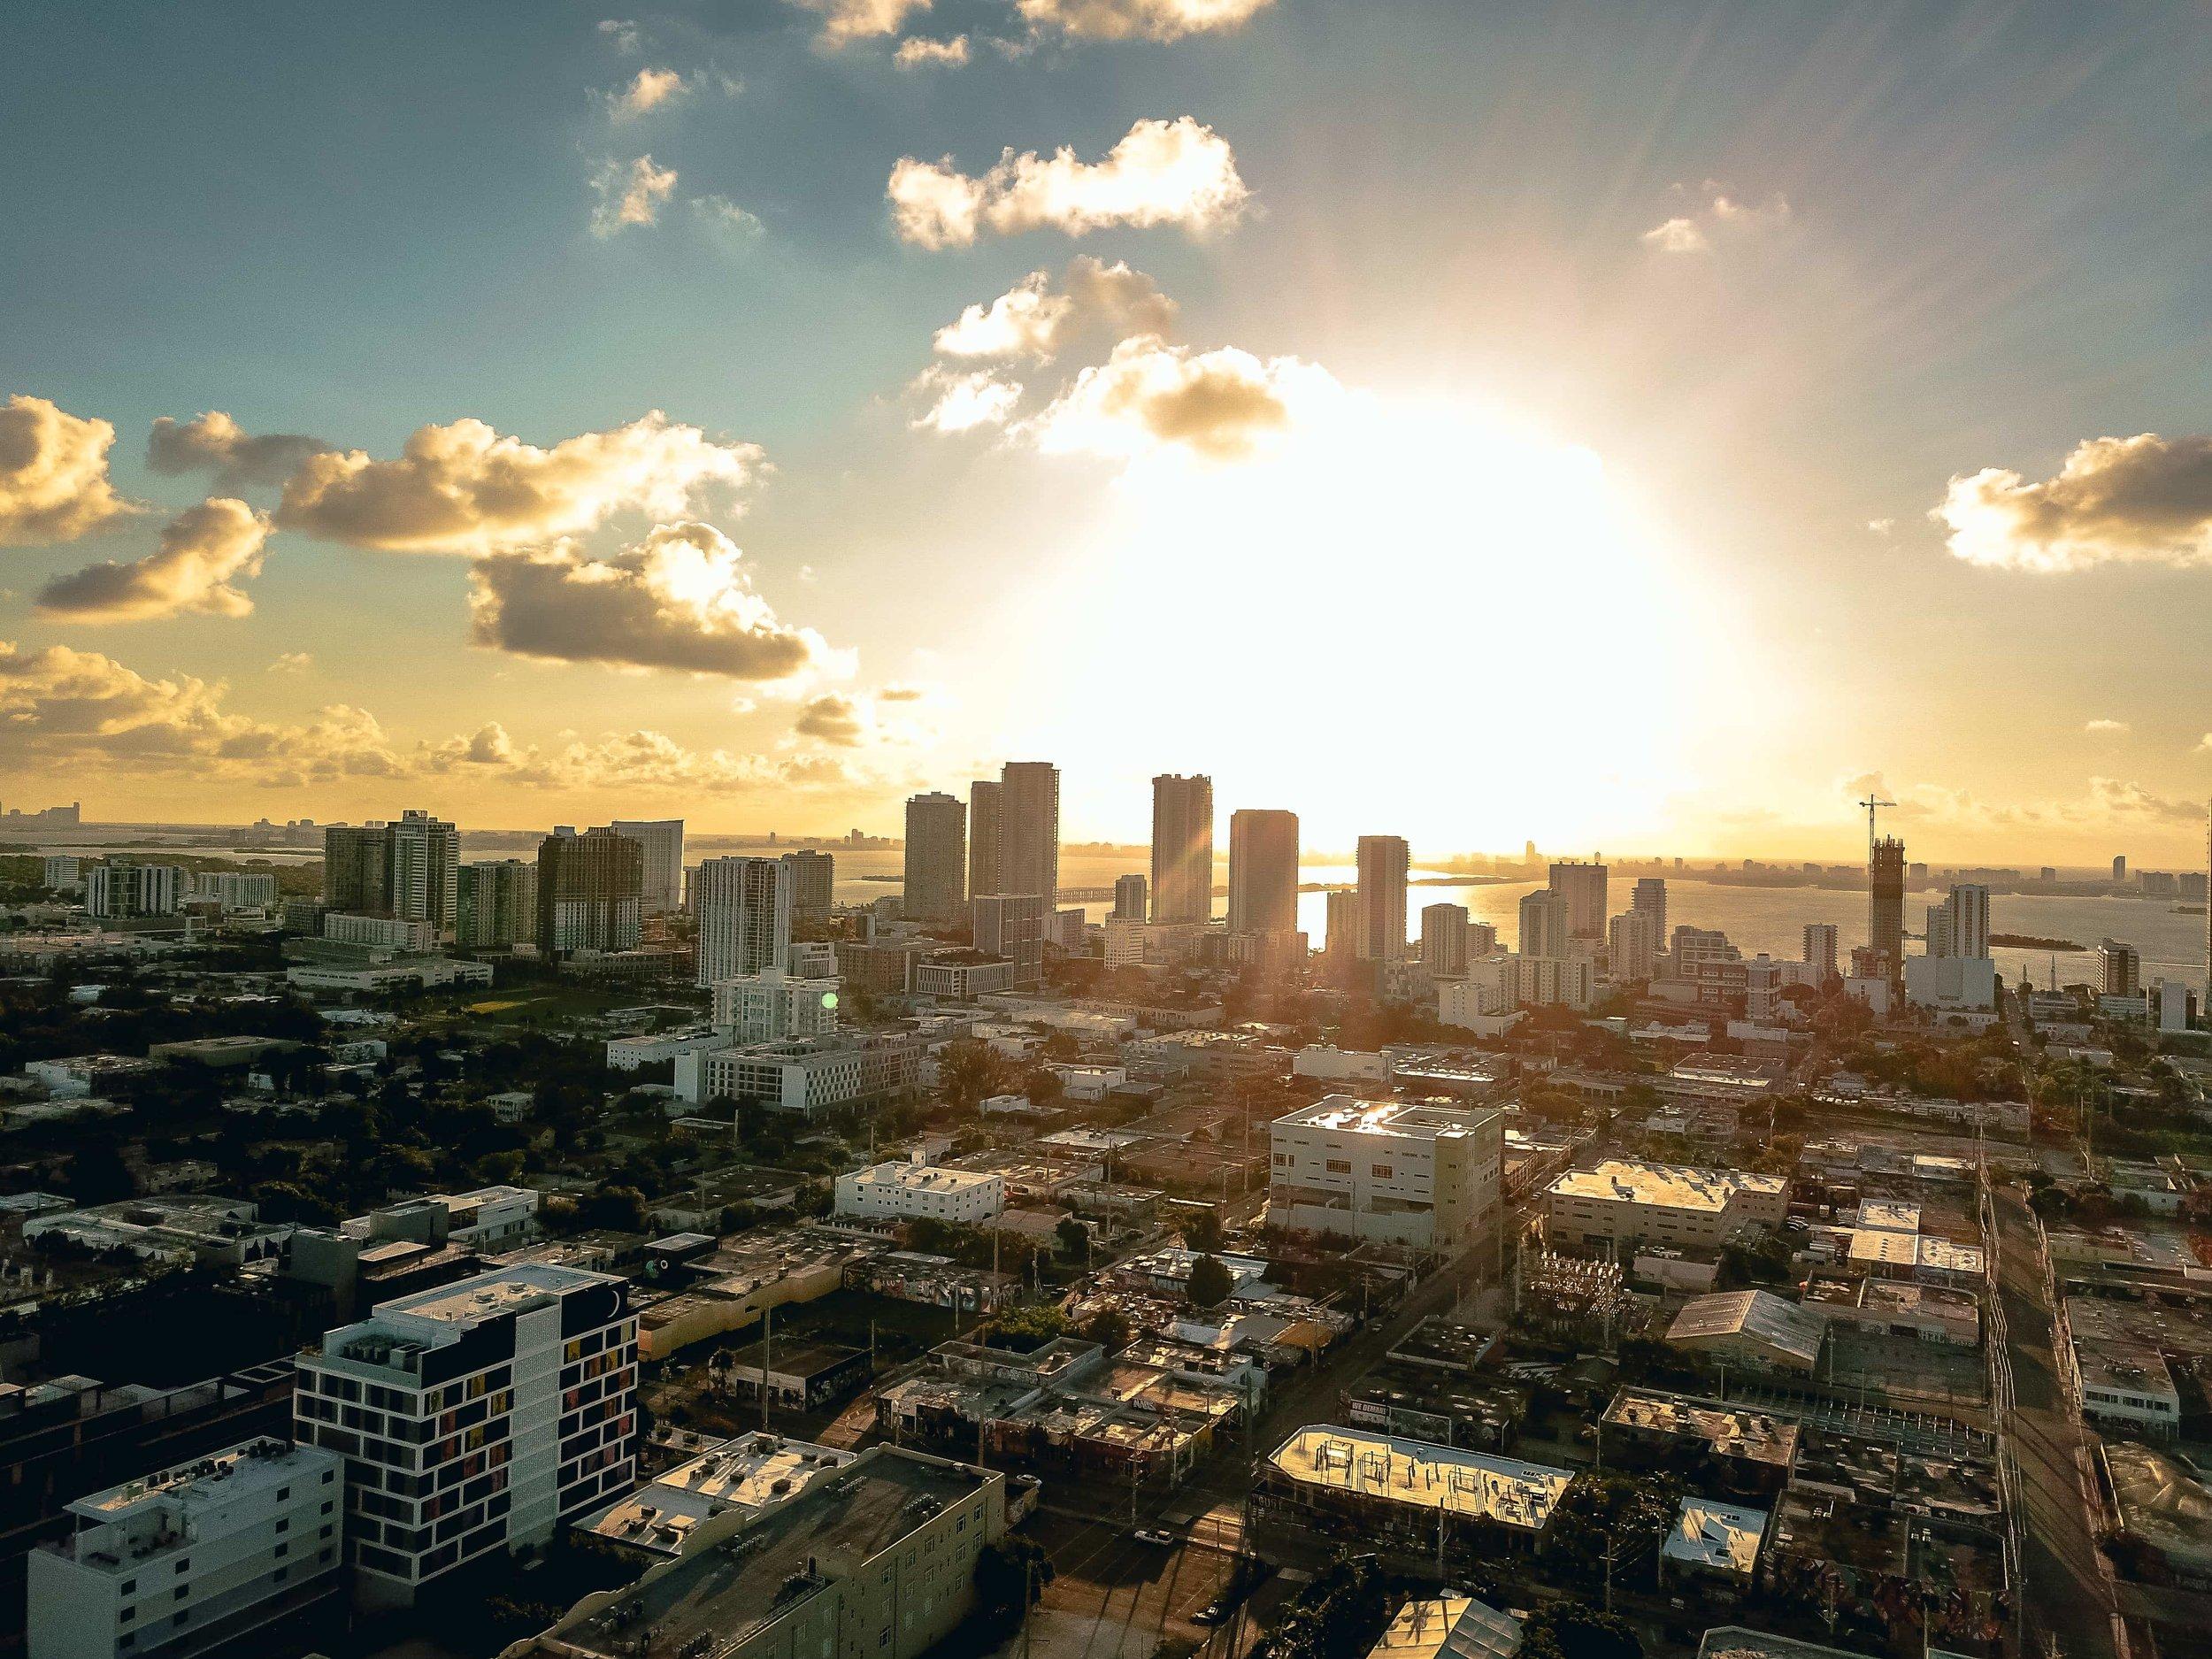 """Sunrise in Miami"", Wynwood, <Travelhund>"